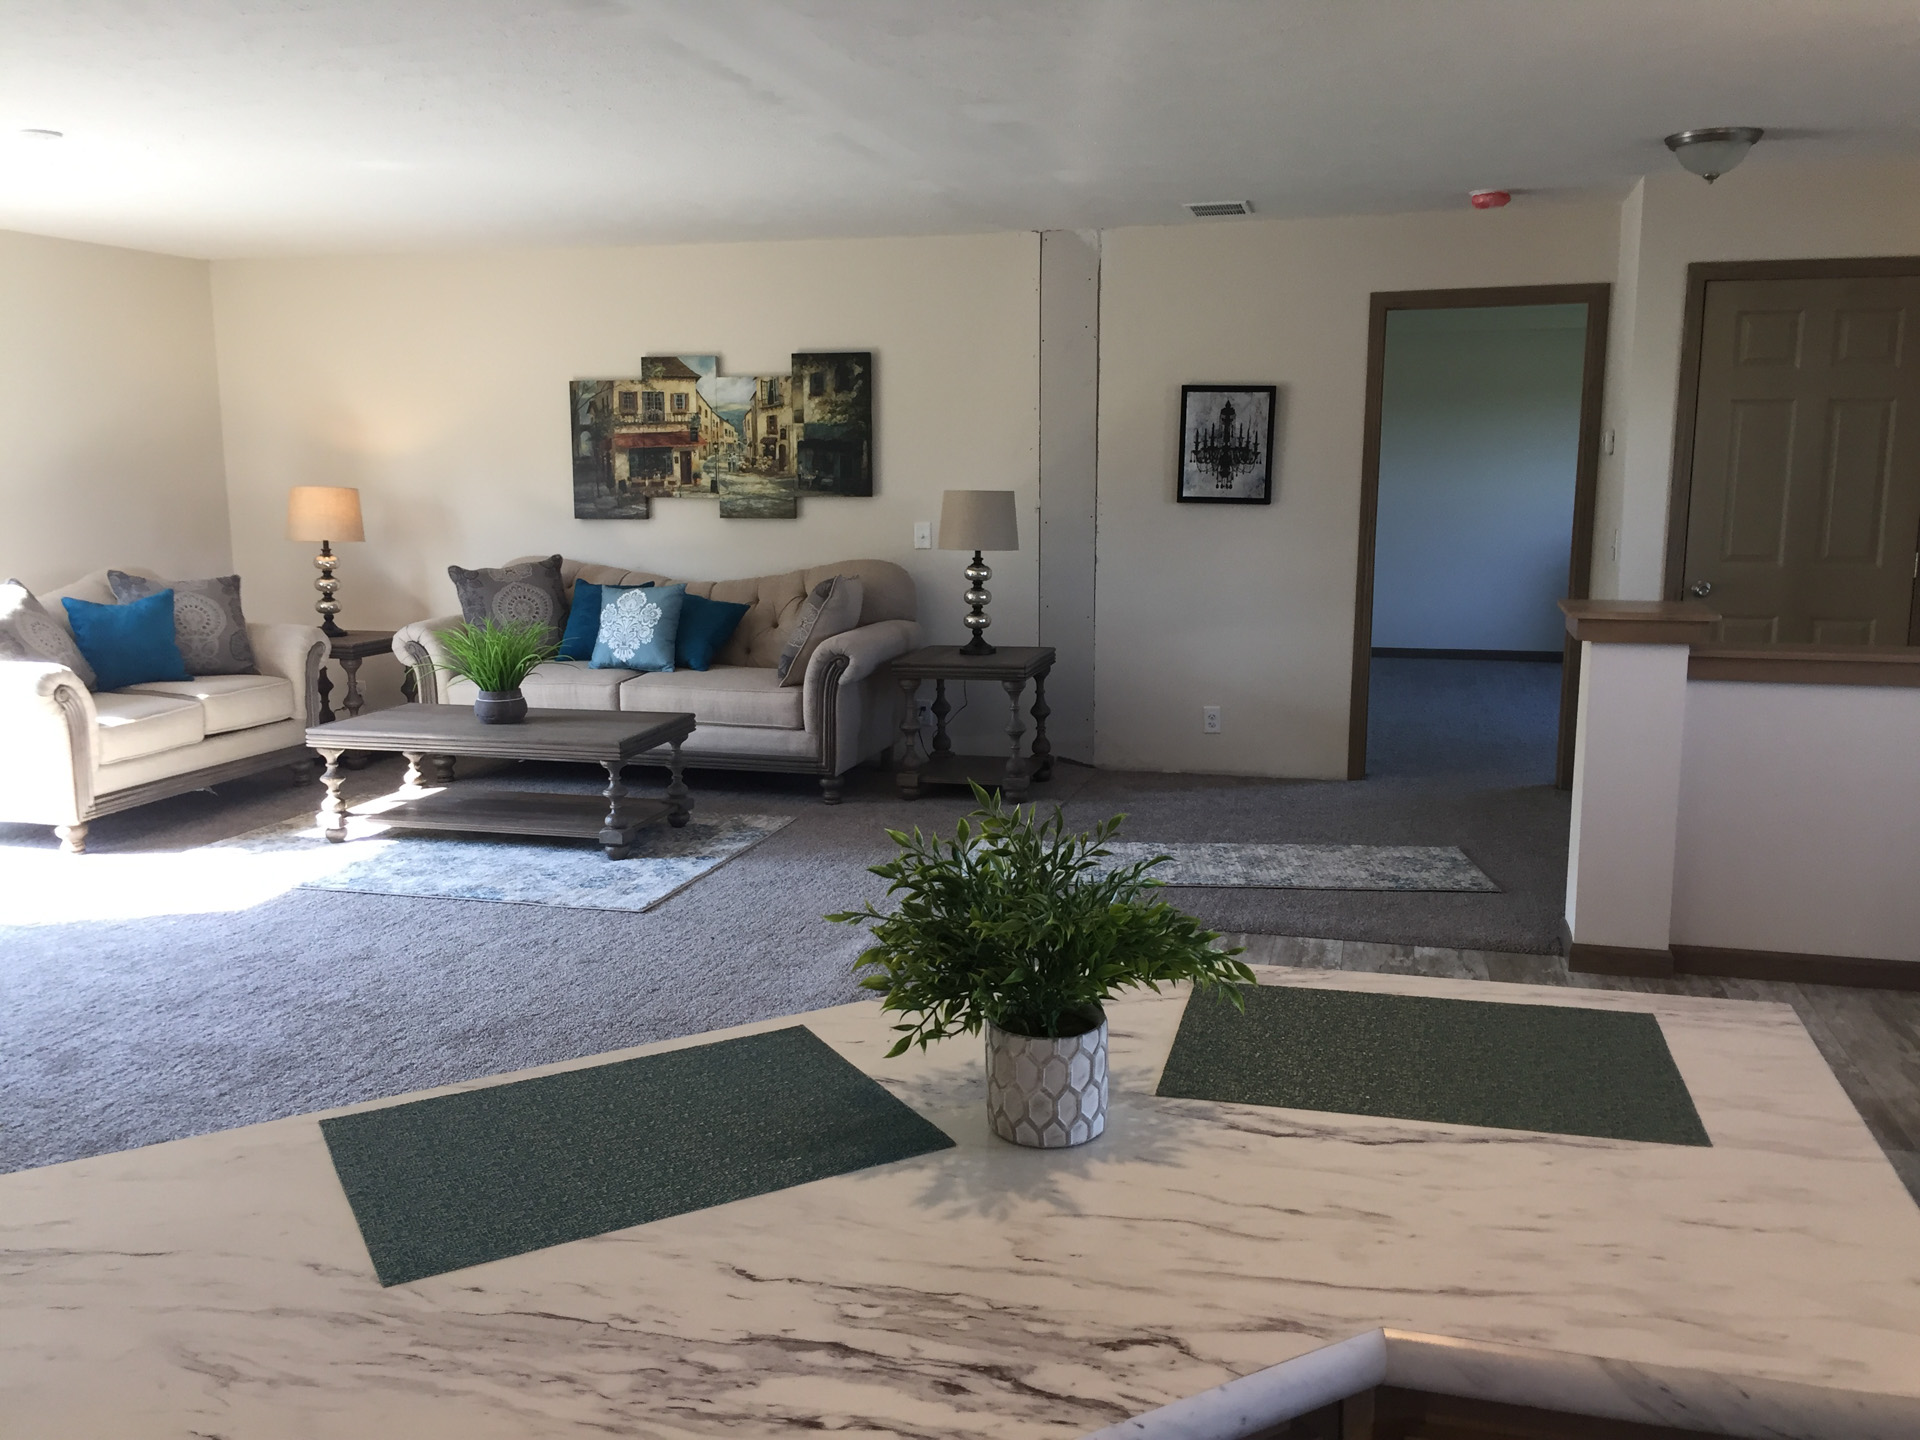 Barton living room